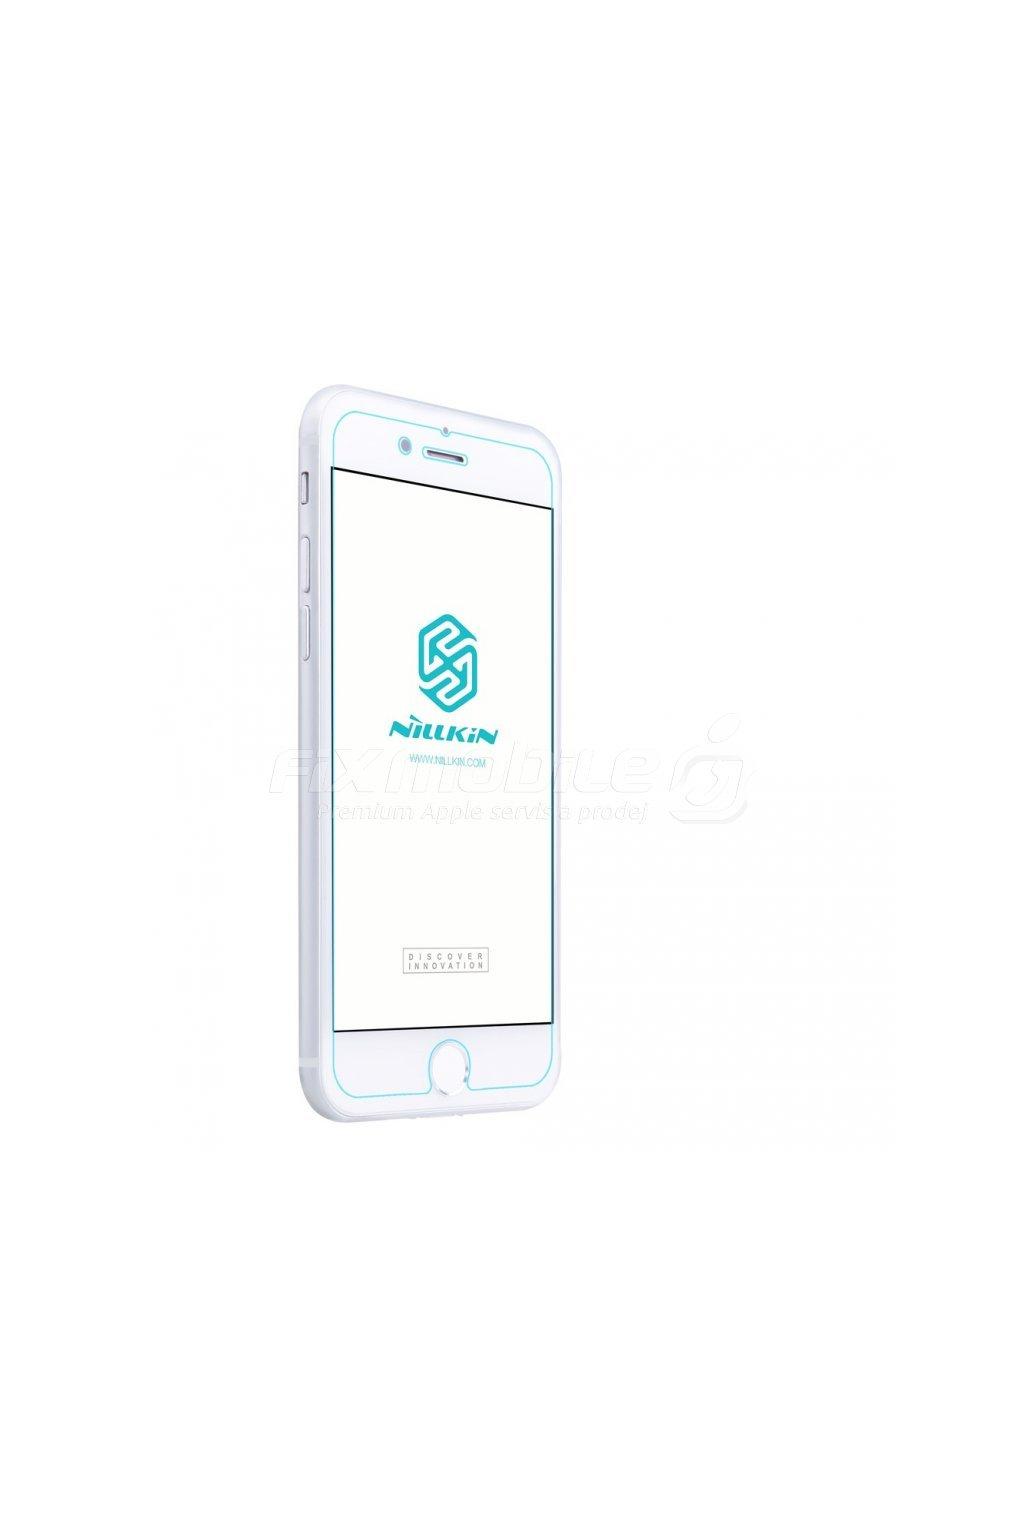 Temperované sklo Nillkin, tvrdost 9H, Apple iPhone 6/6s/7/8